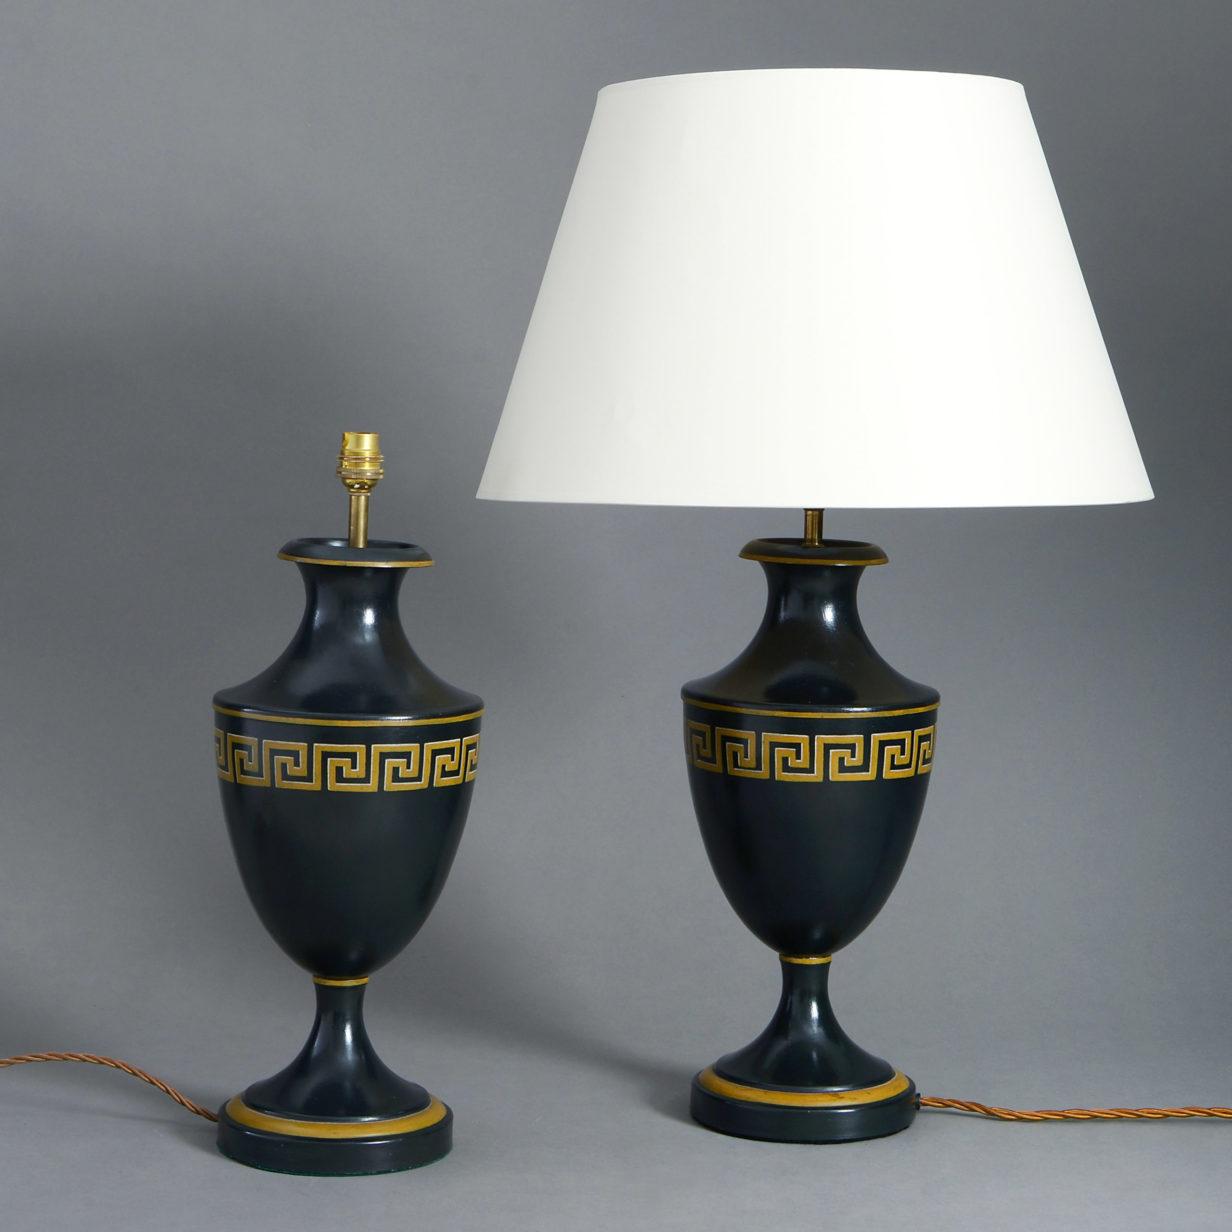 Pair of Tole Greek Key Lamps